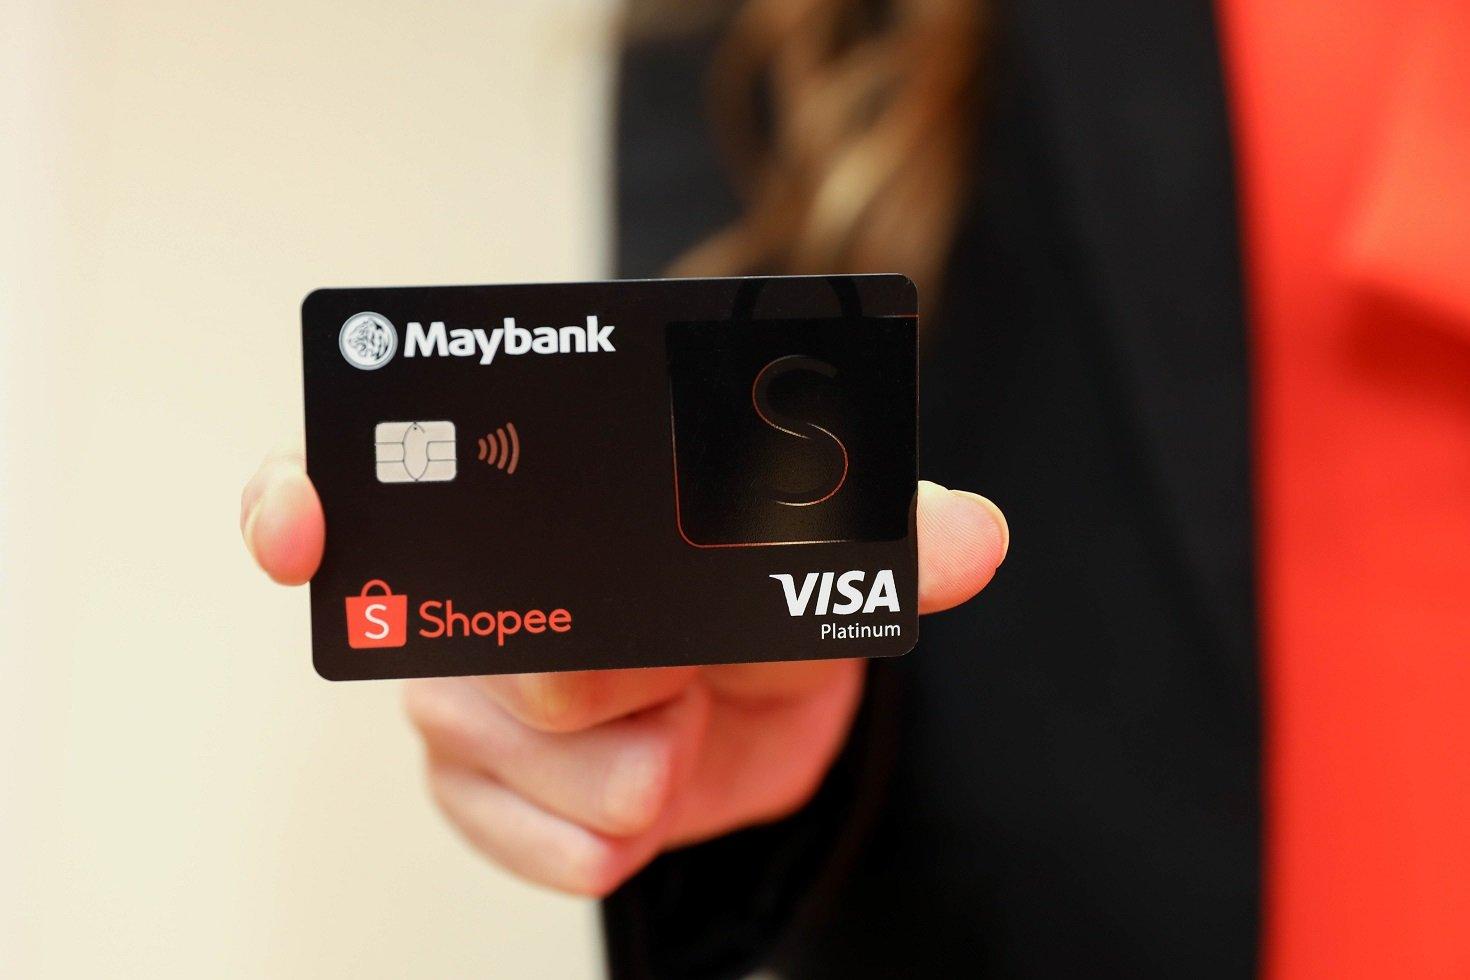 maybank shopee visa platinum